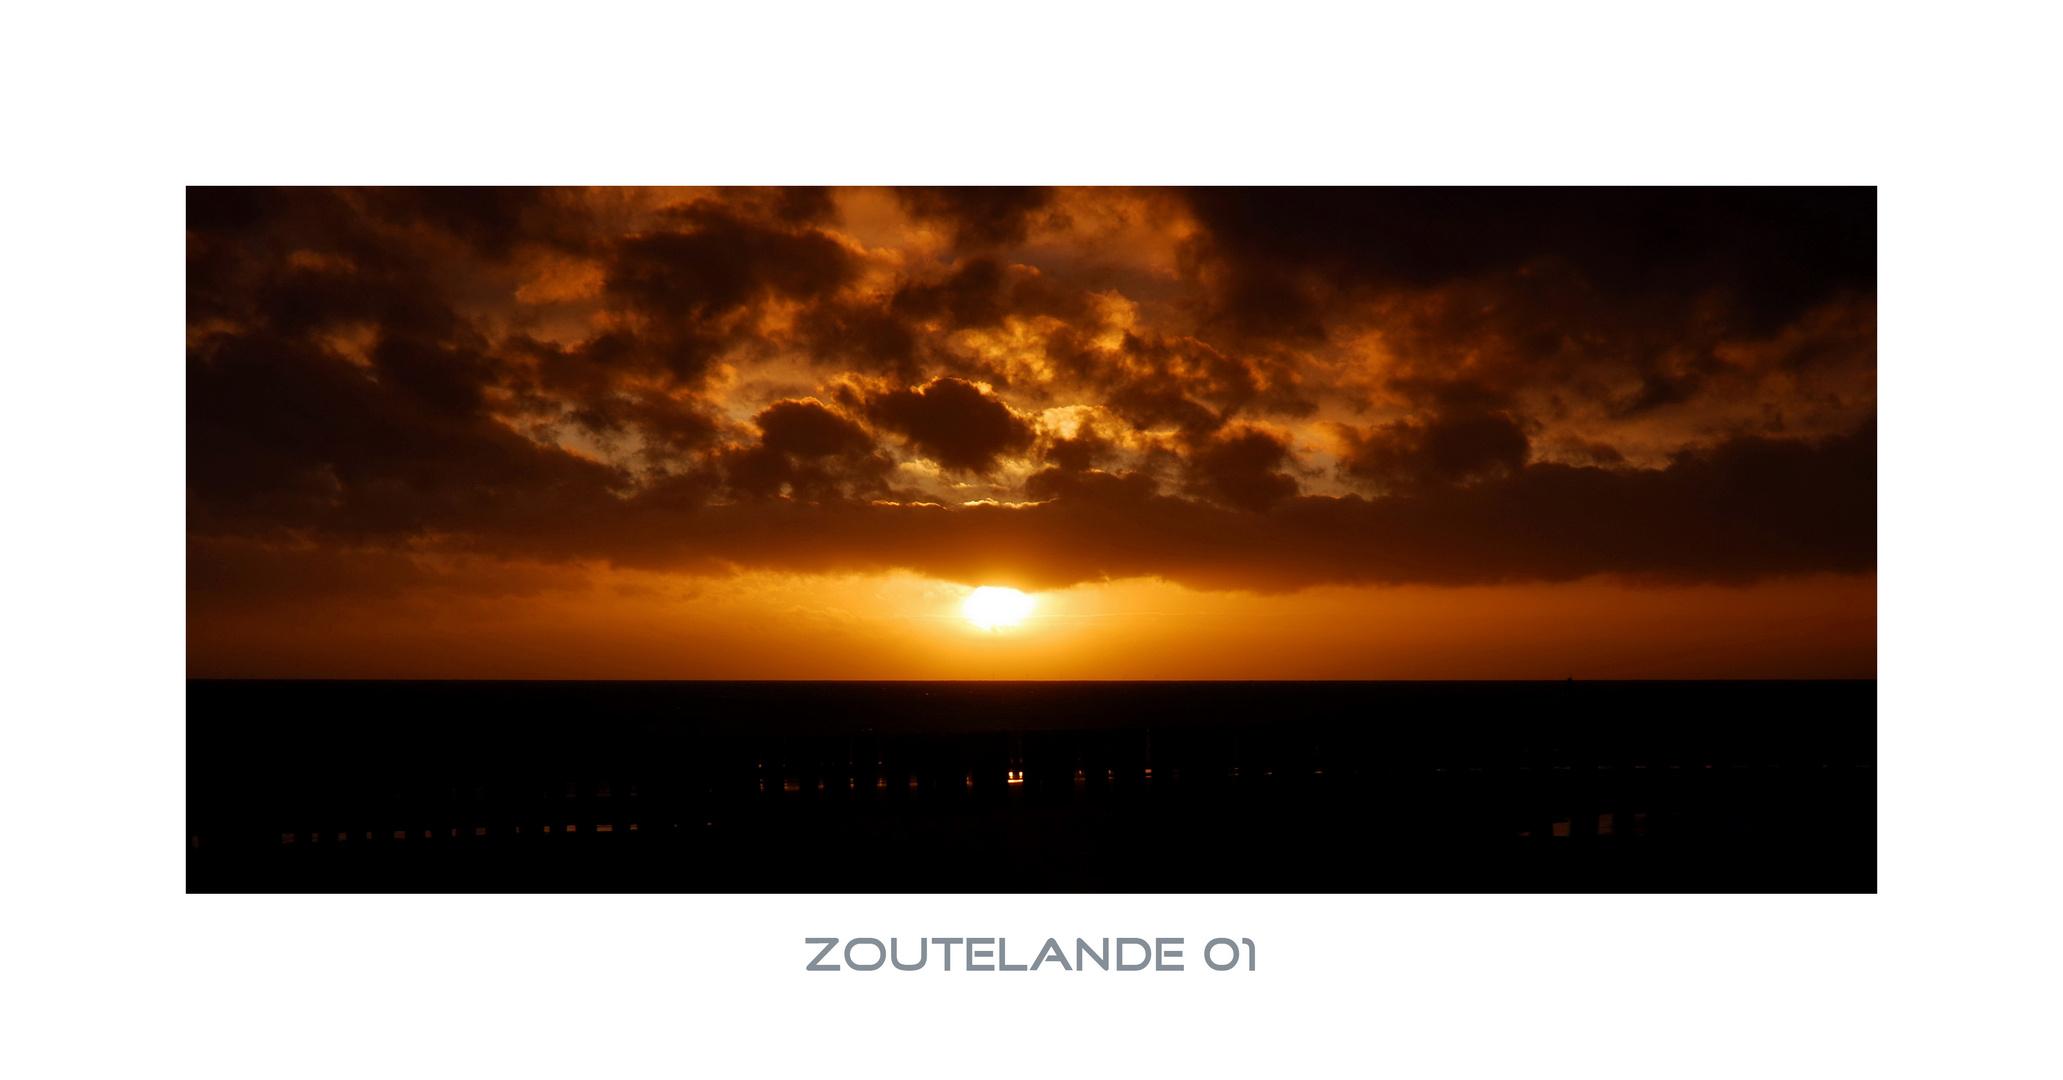 zoutelande 01